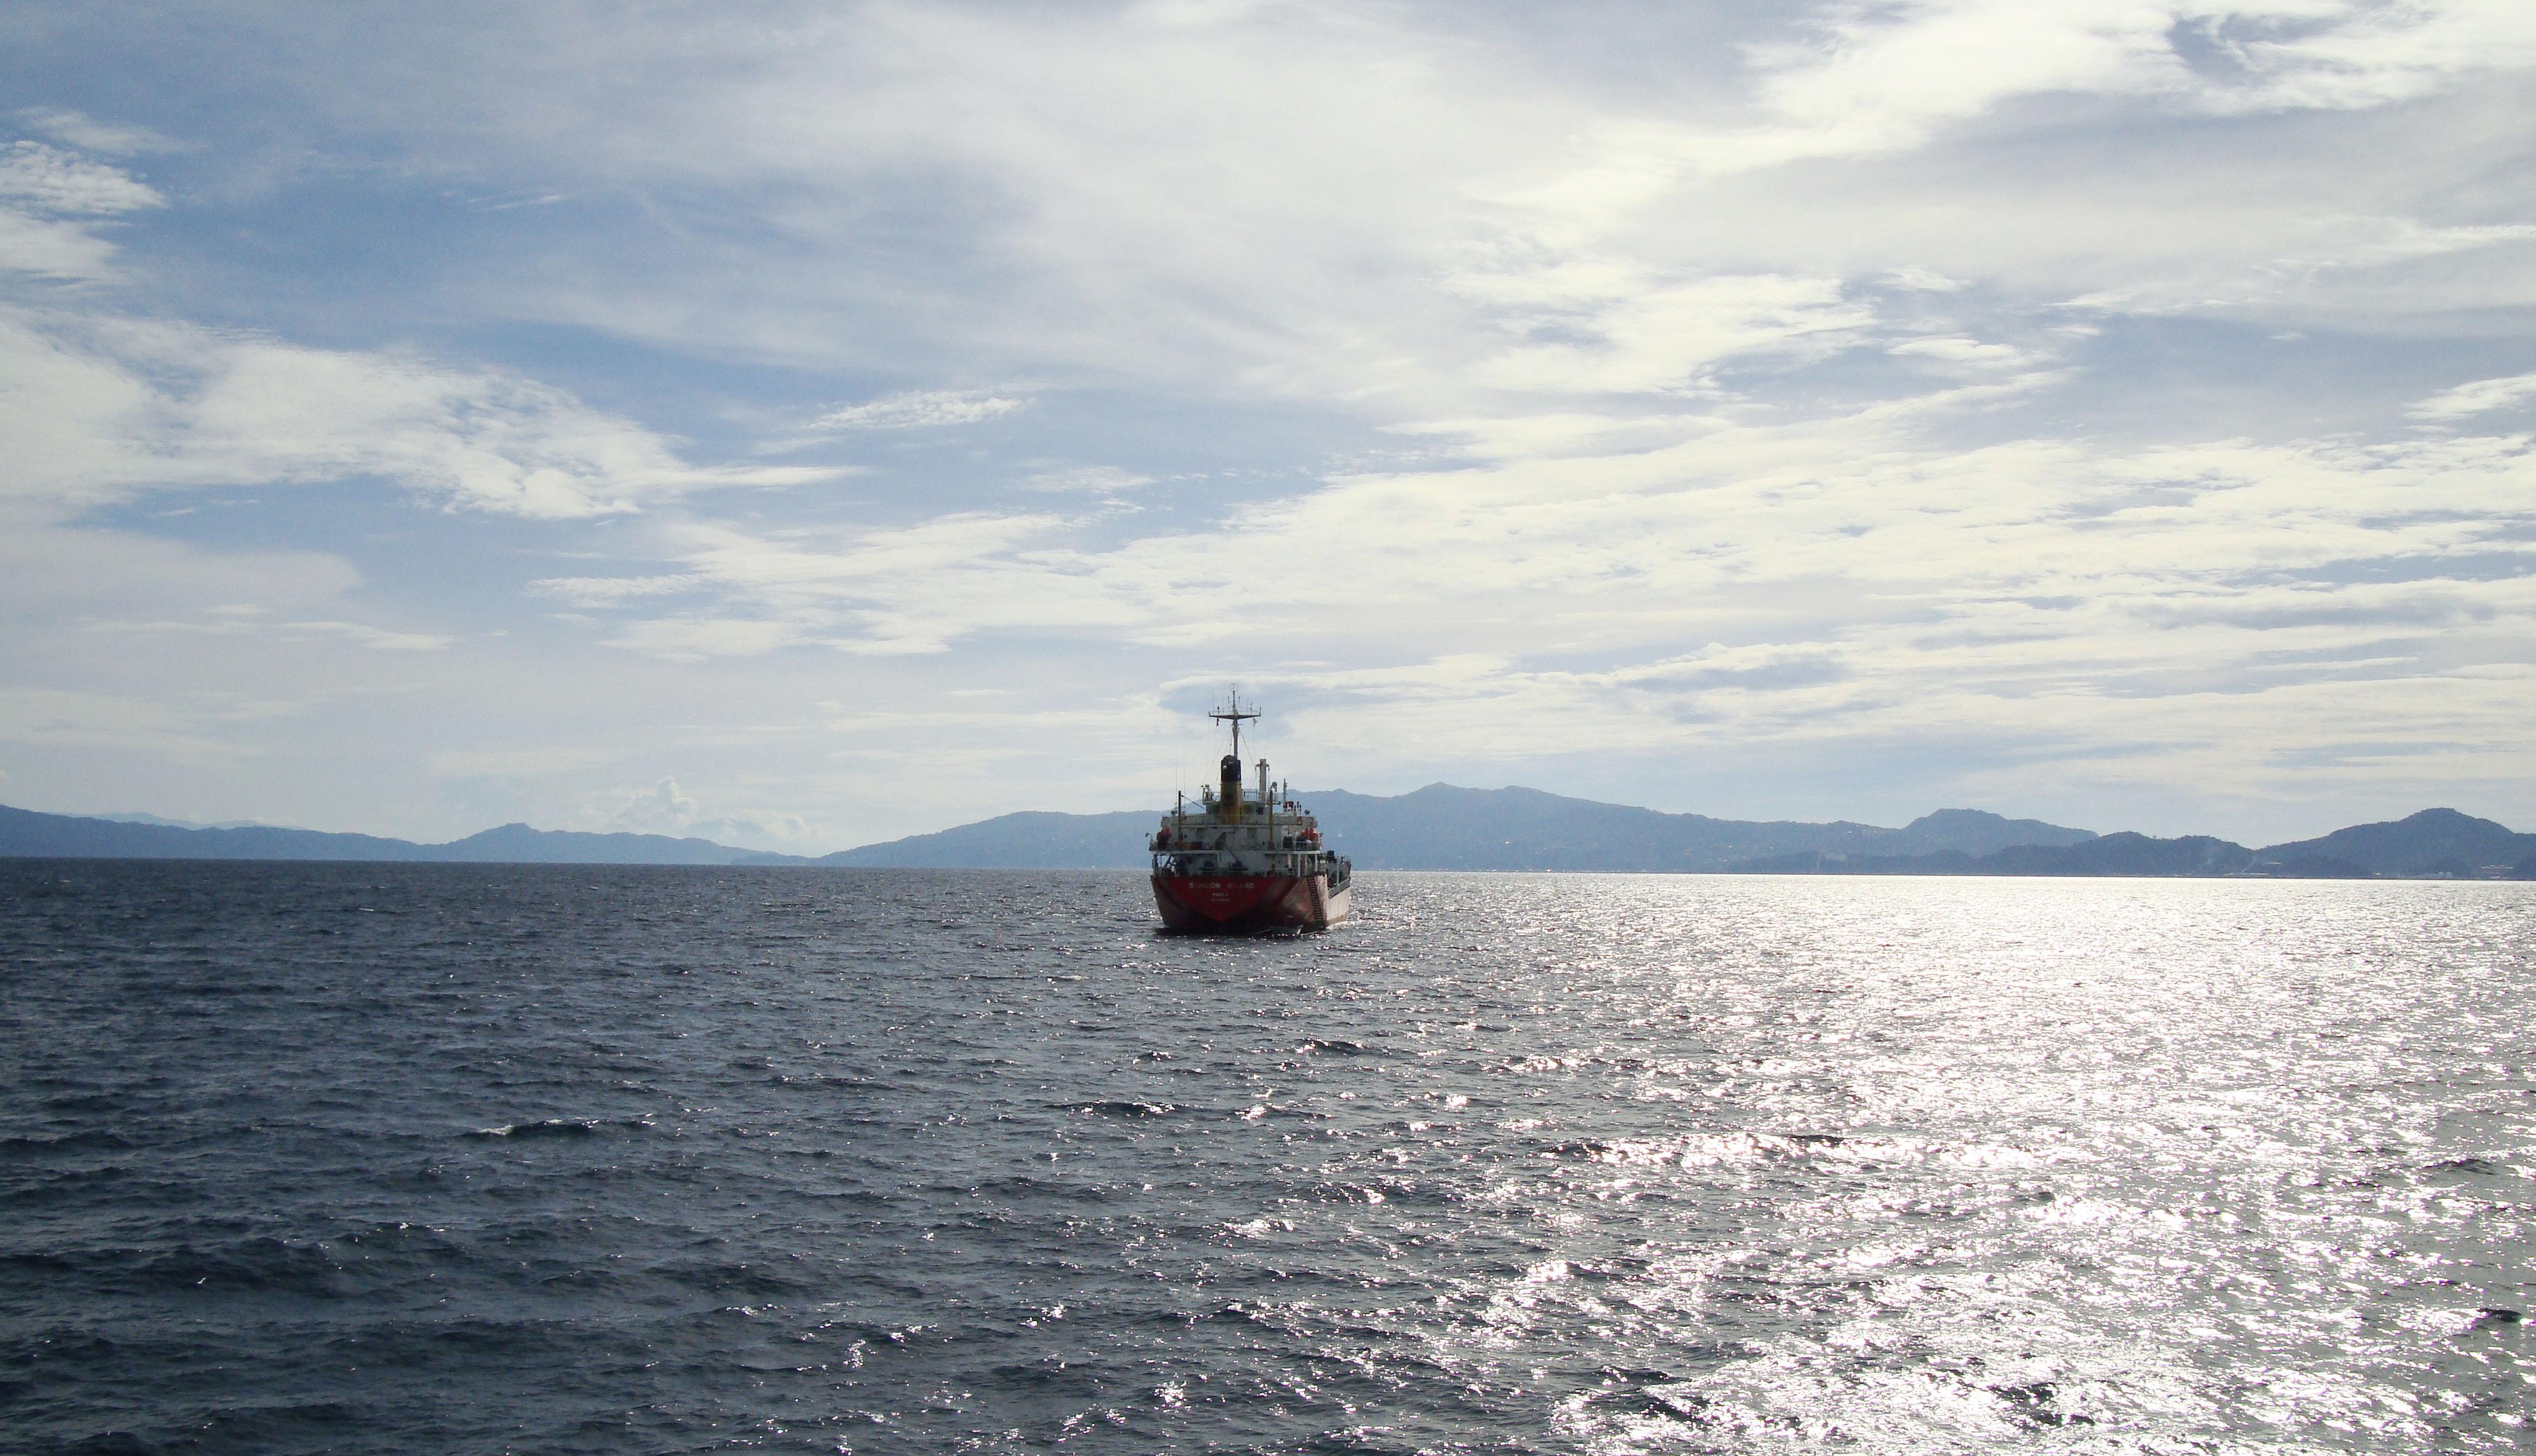 MV Sumilon Island Batangus Philppines 2010 02